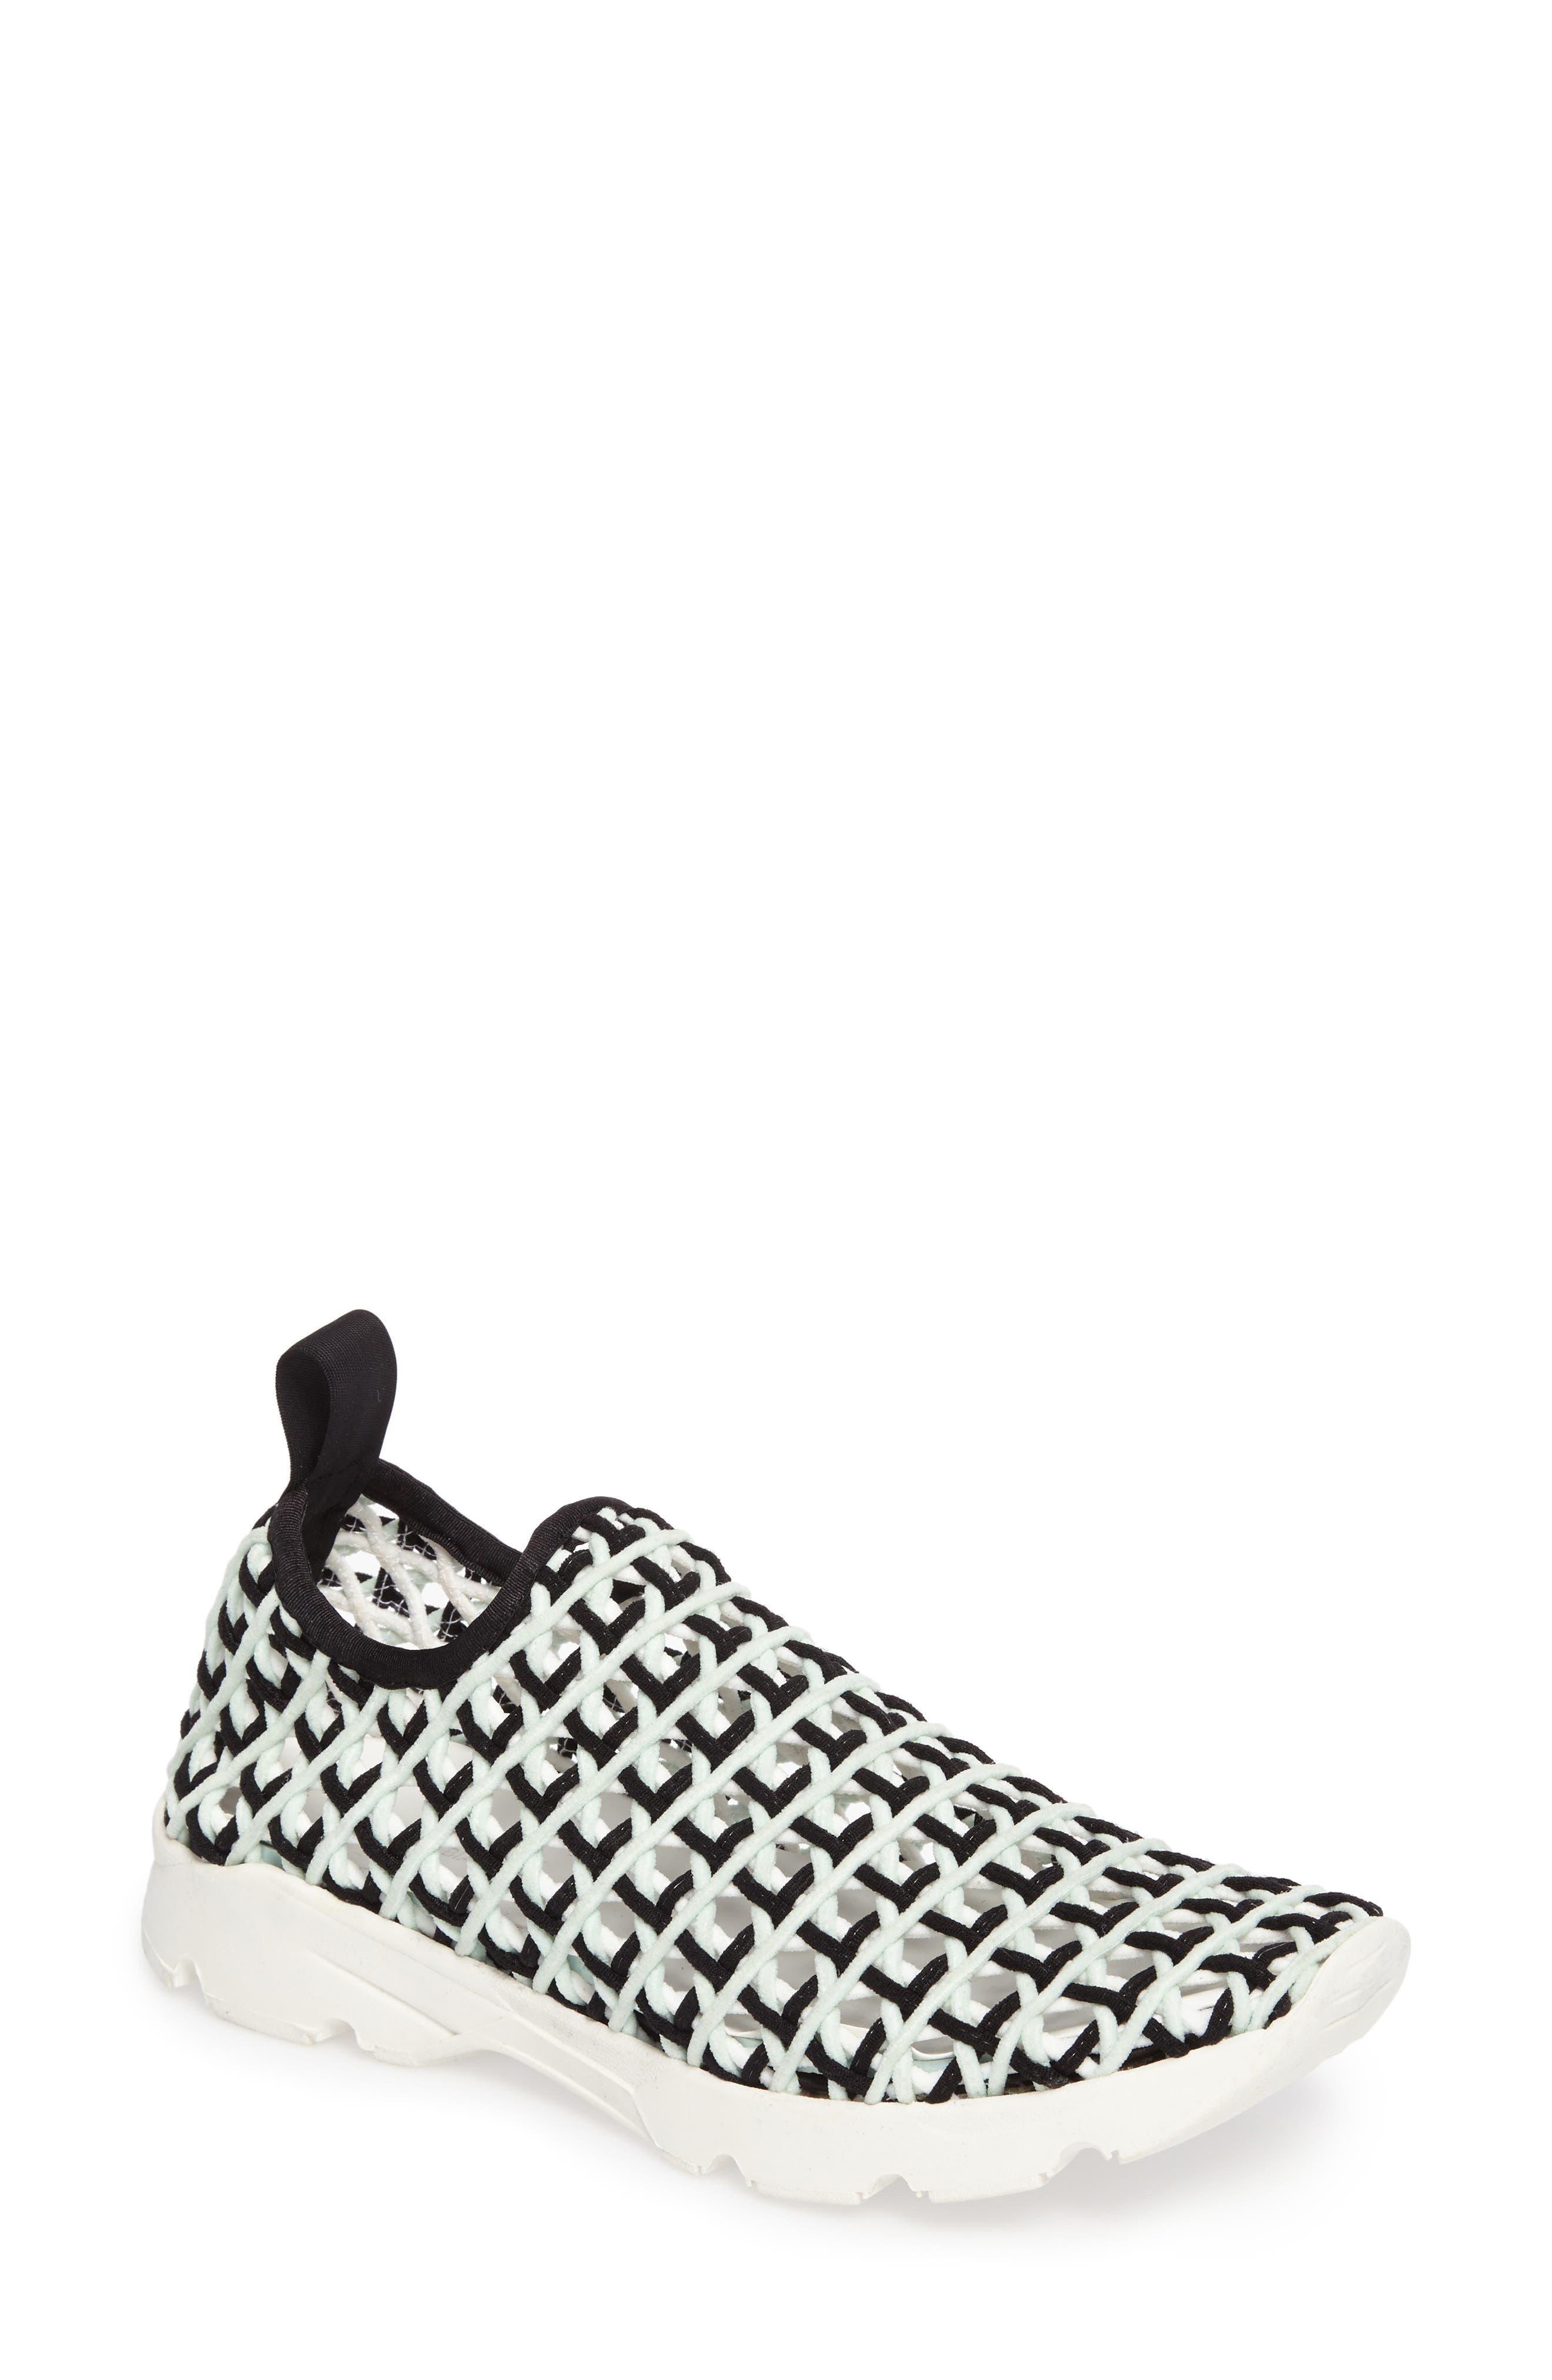 Main Image - Tony Bianco Willow Open Knit Sneaker (Women)